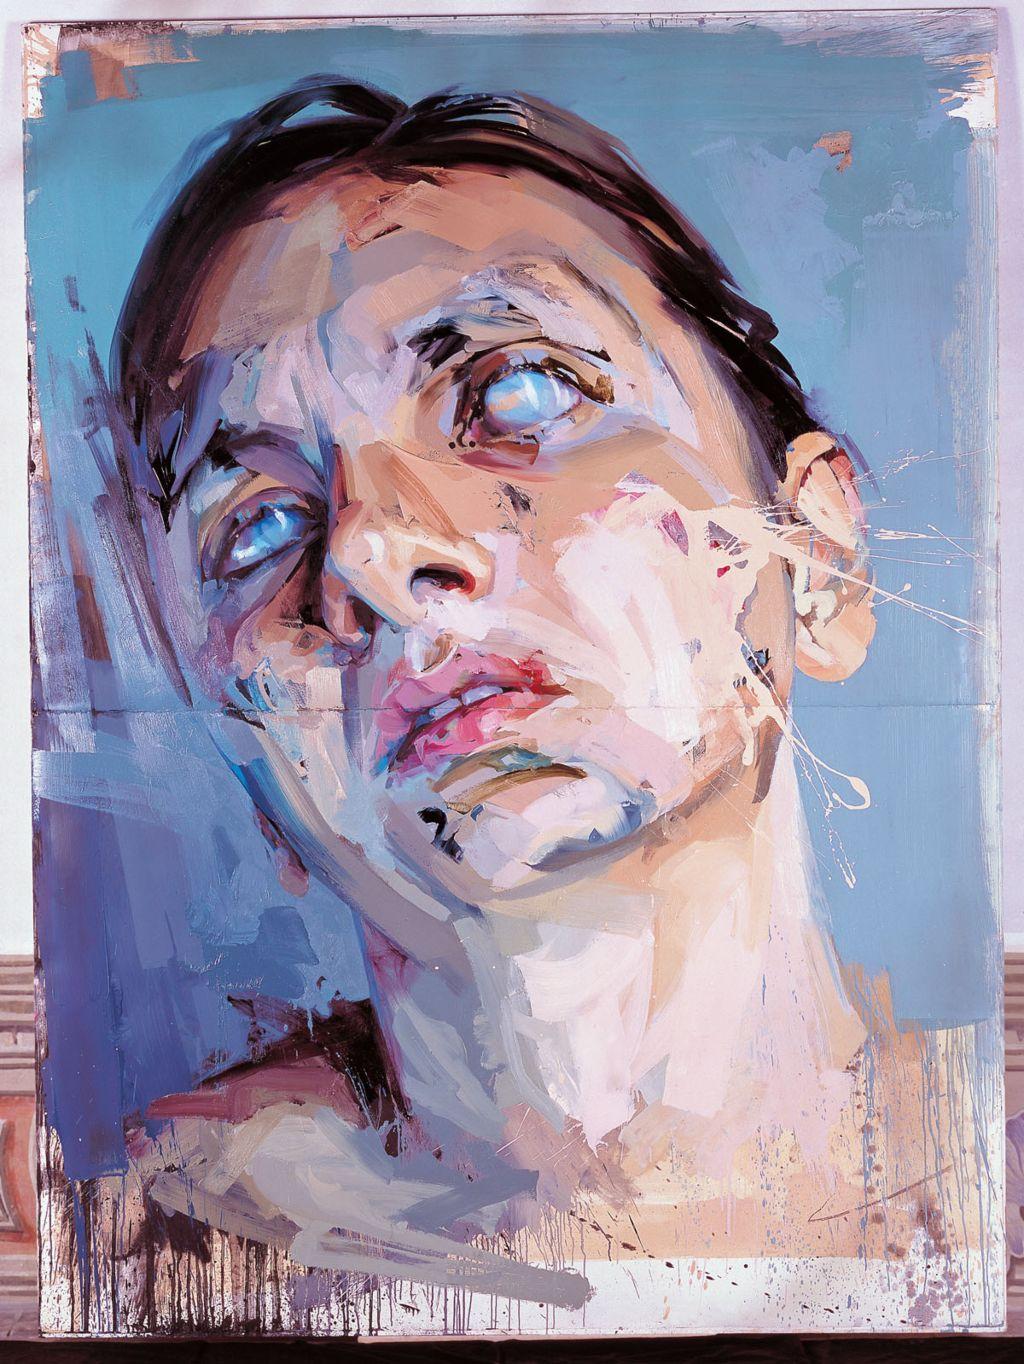 Jenny saville contemporary art pinterest jenny for Artistic mural works